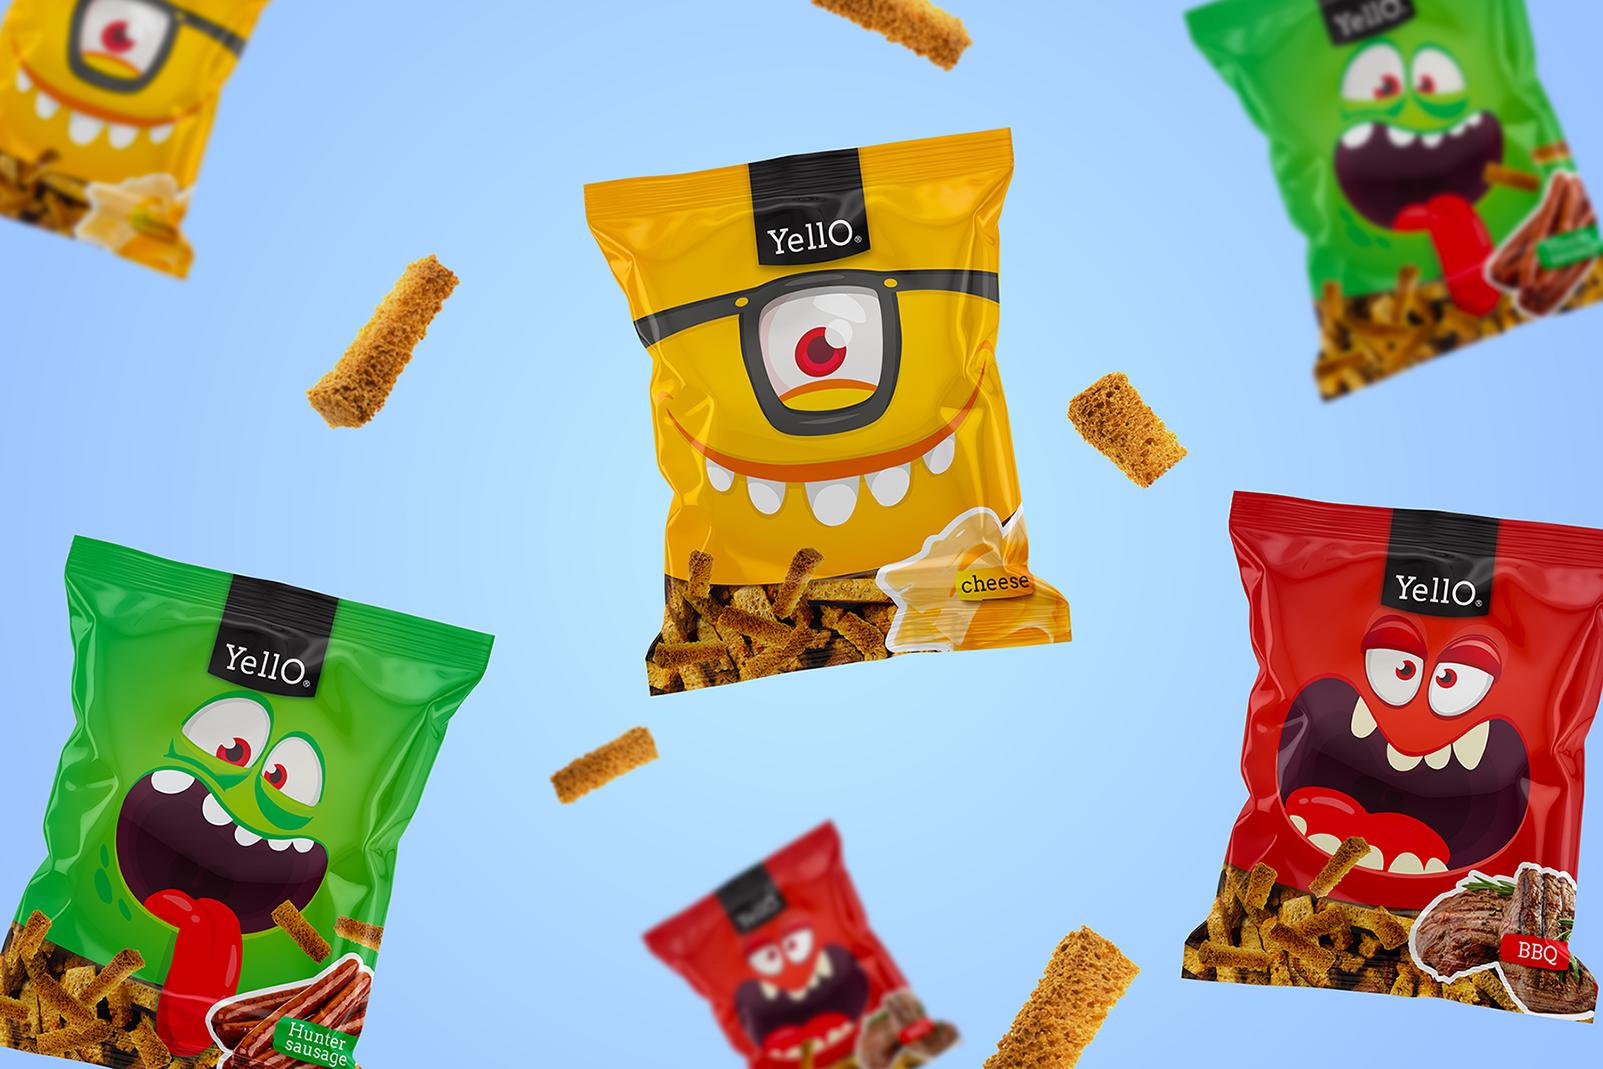 Minim Design Creative Packaging For Yello Snacks